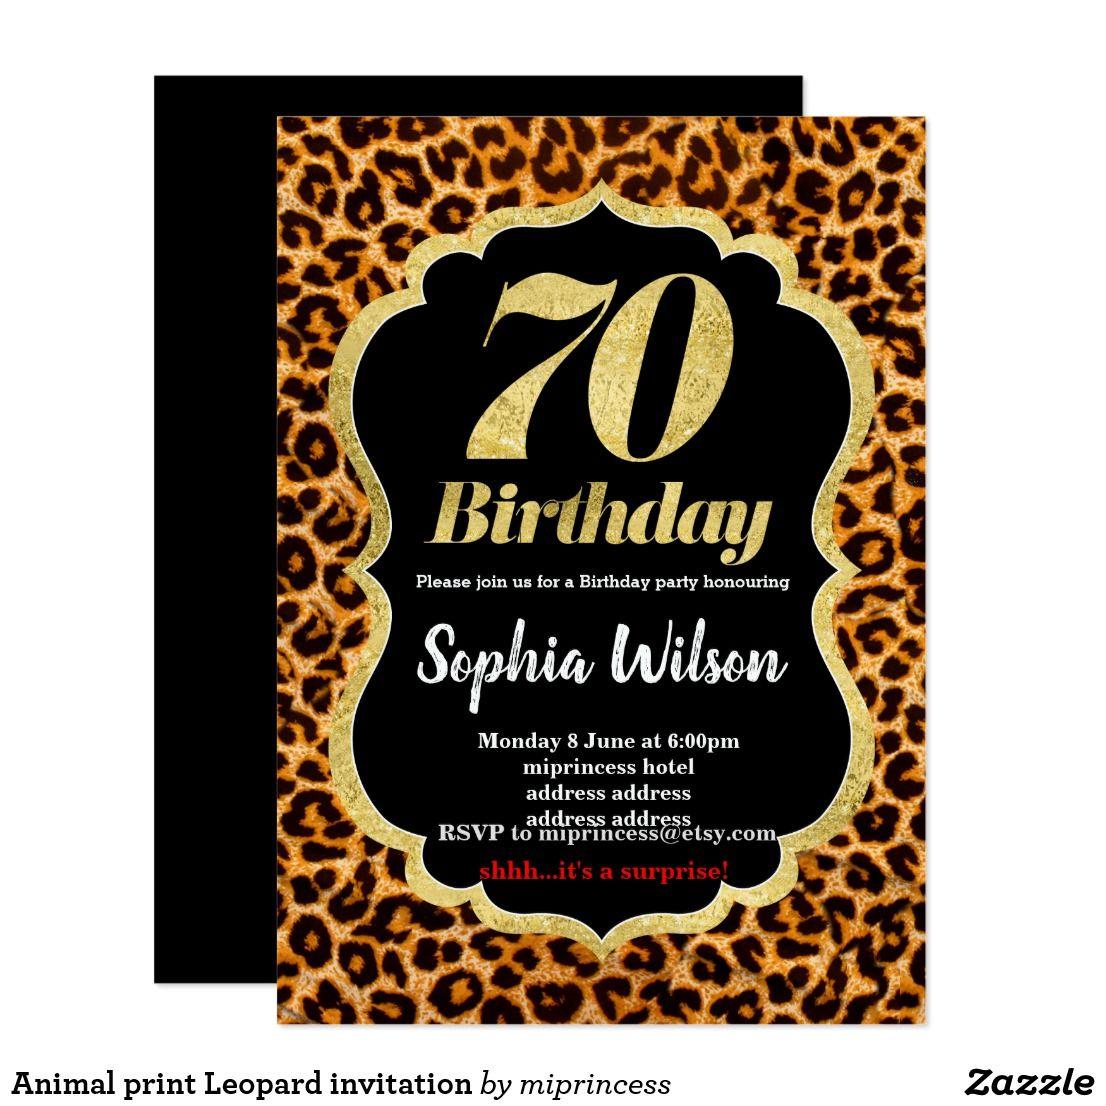 Animal print Leopard invitation | Party fun and Birthdays